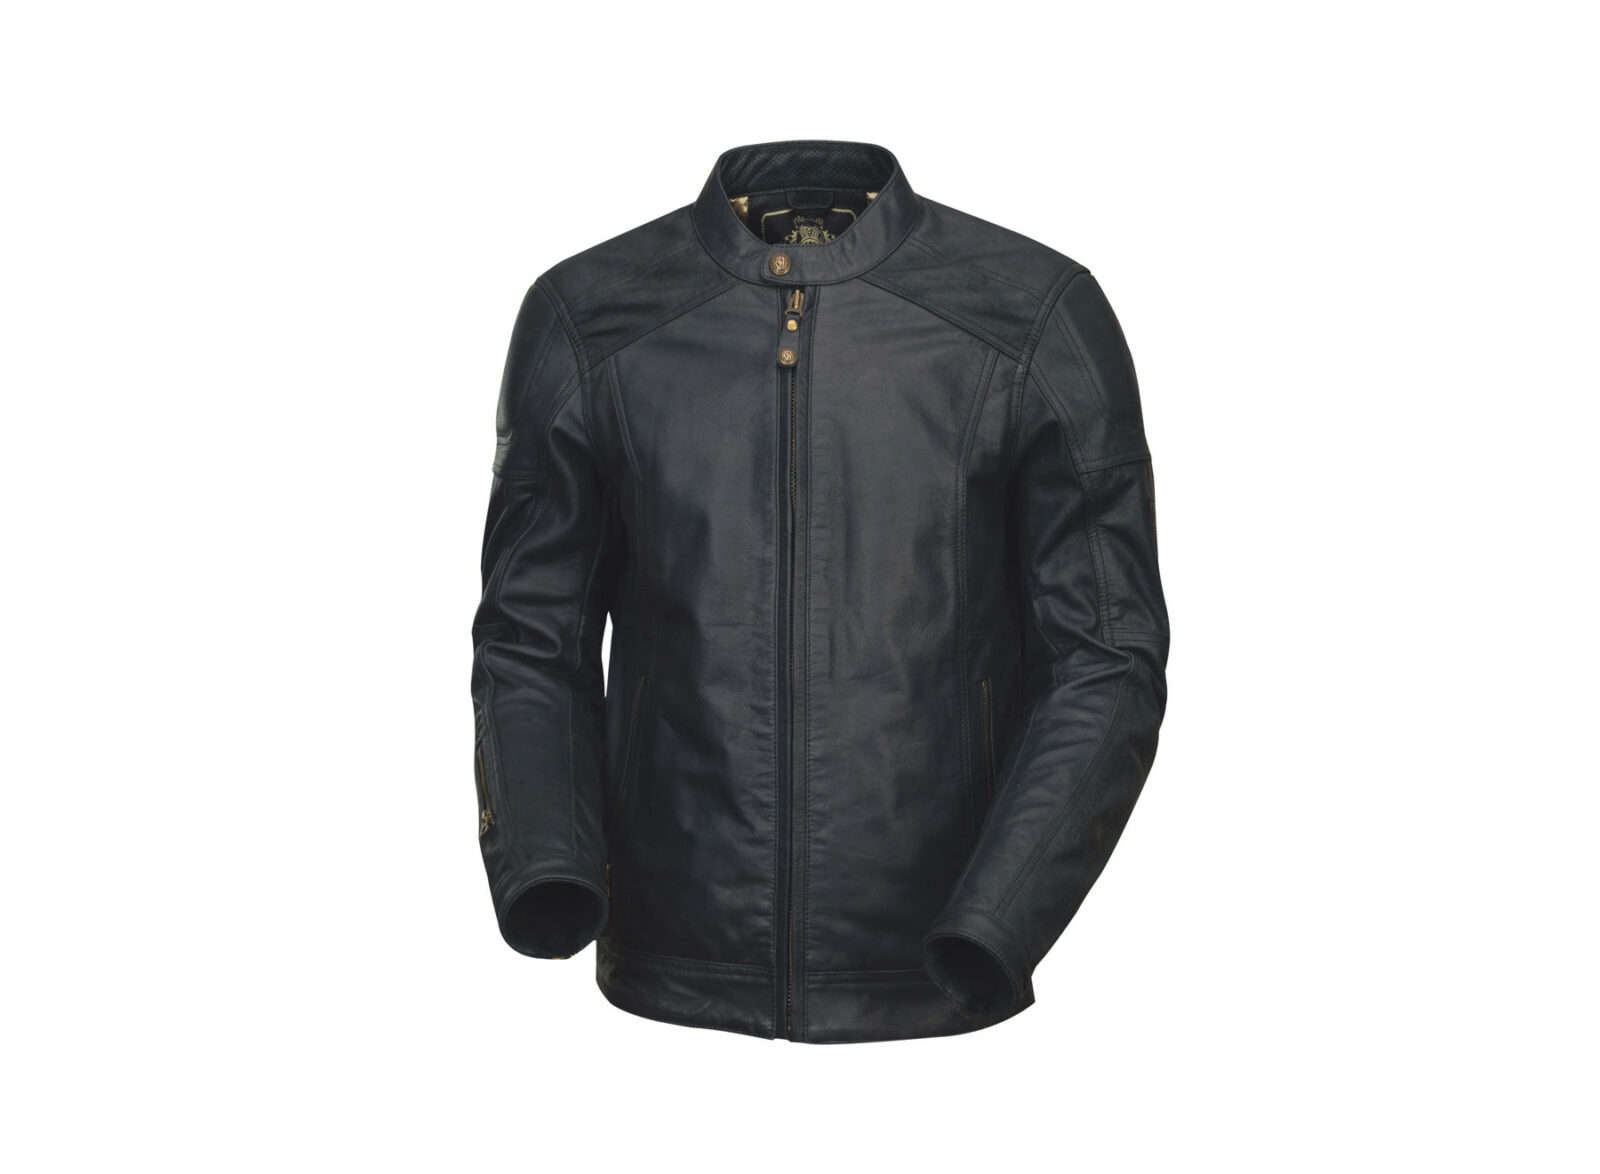 RSD Carson Motorcycle Jacket 1600x1174 - The RSD Carson Motorcycle Jacket